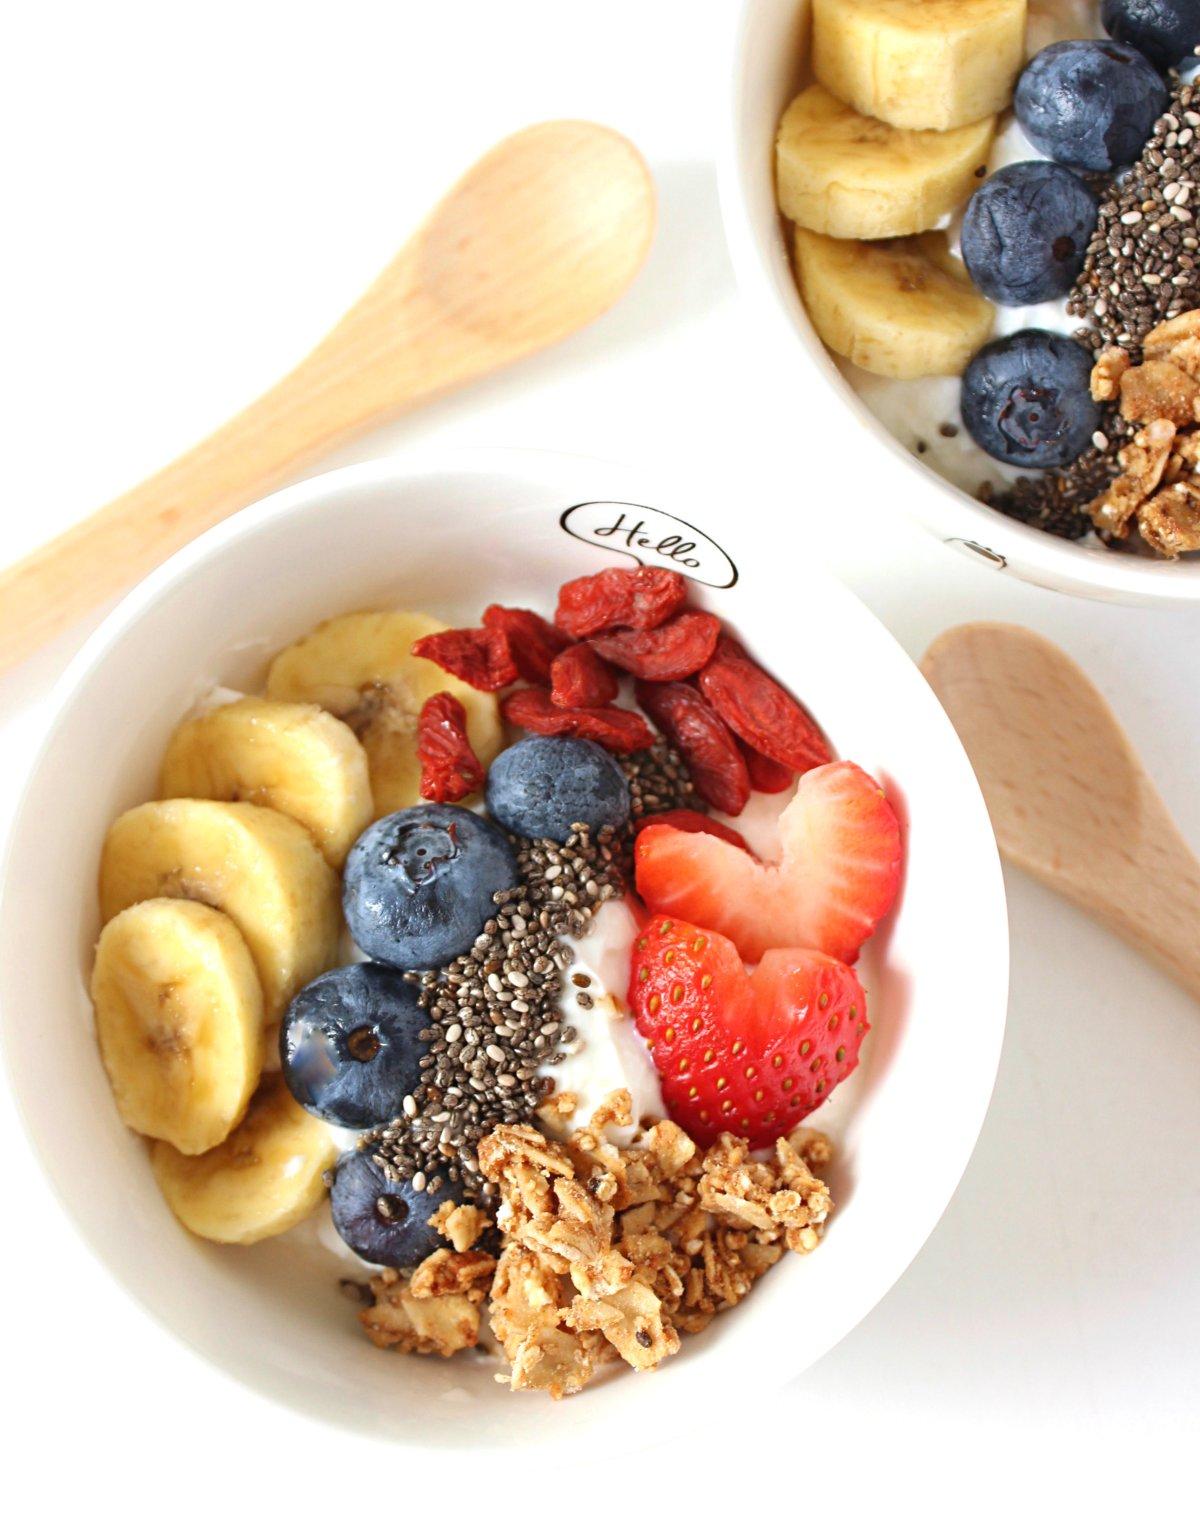 Healthy and Simple Yogurt parfait for kids